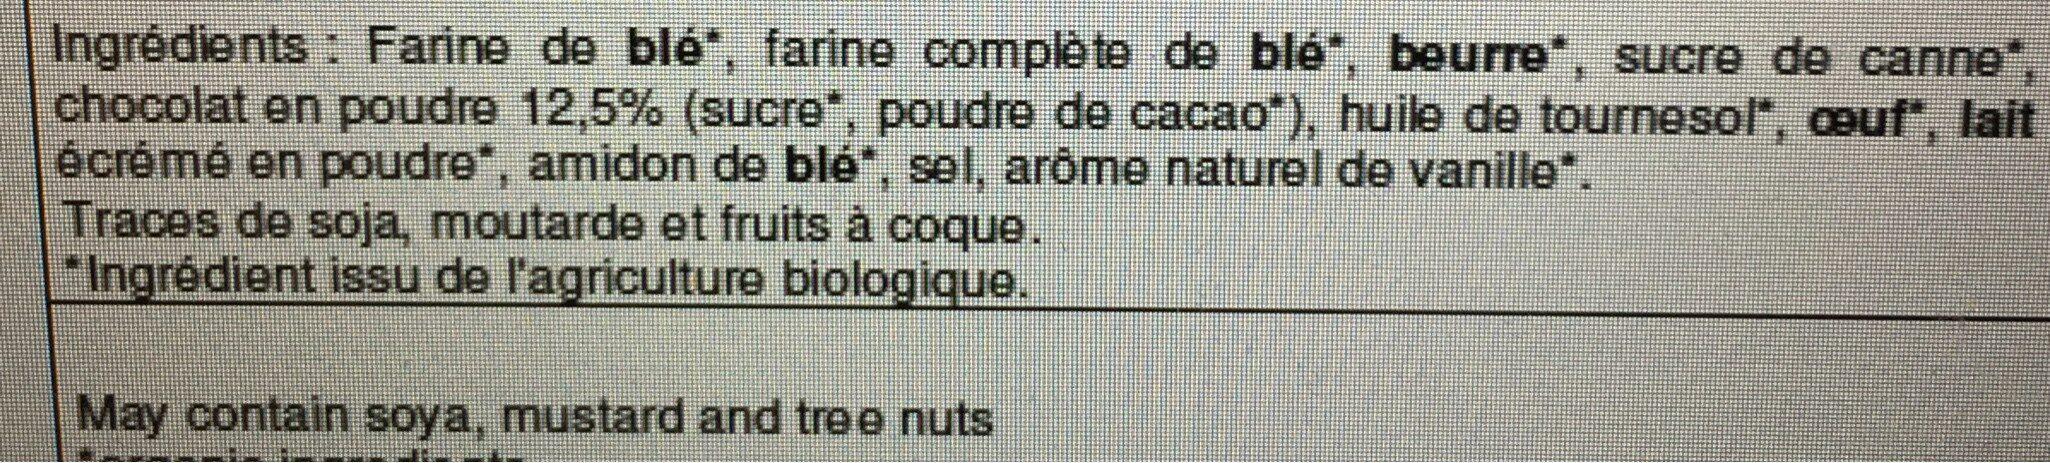 Essai chocolat - Ingrédients - fr